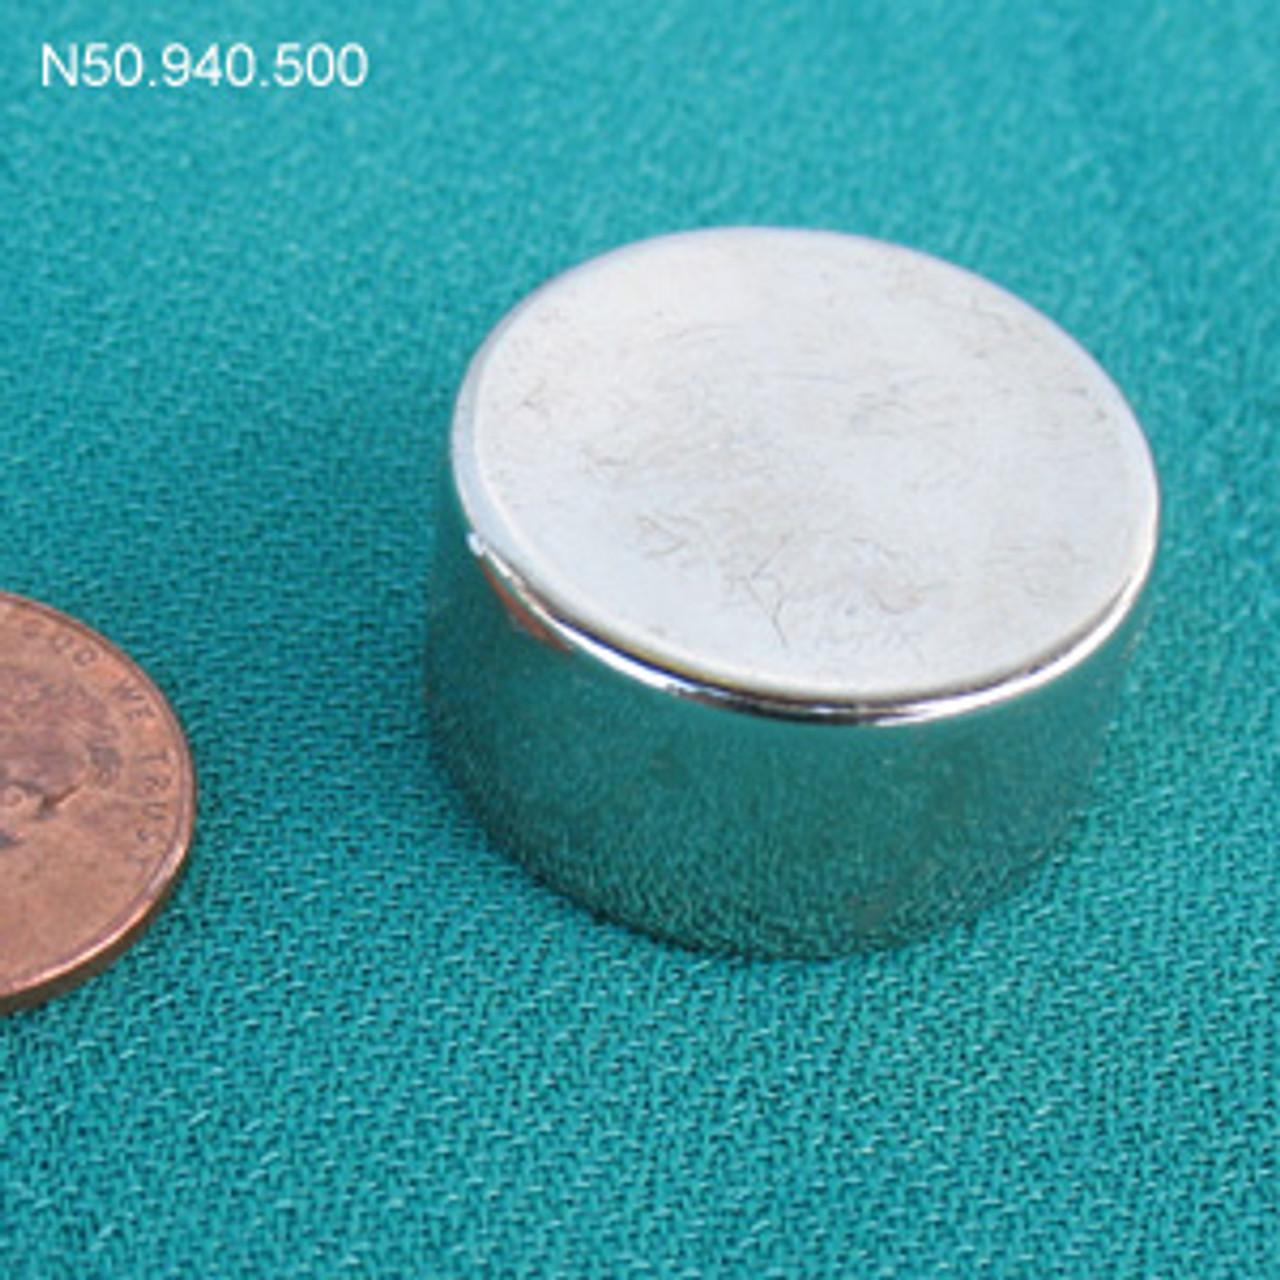 Neodymium Magnet, N35.750.250